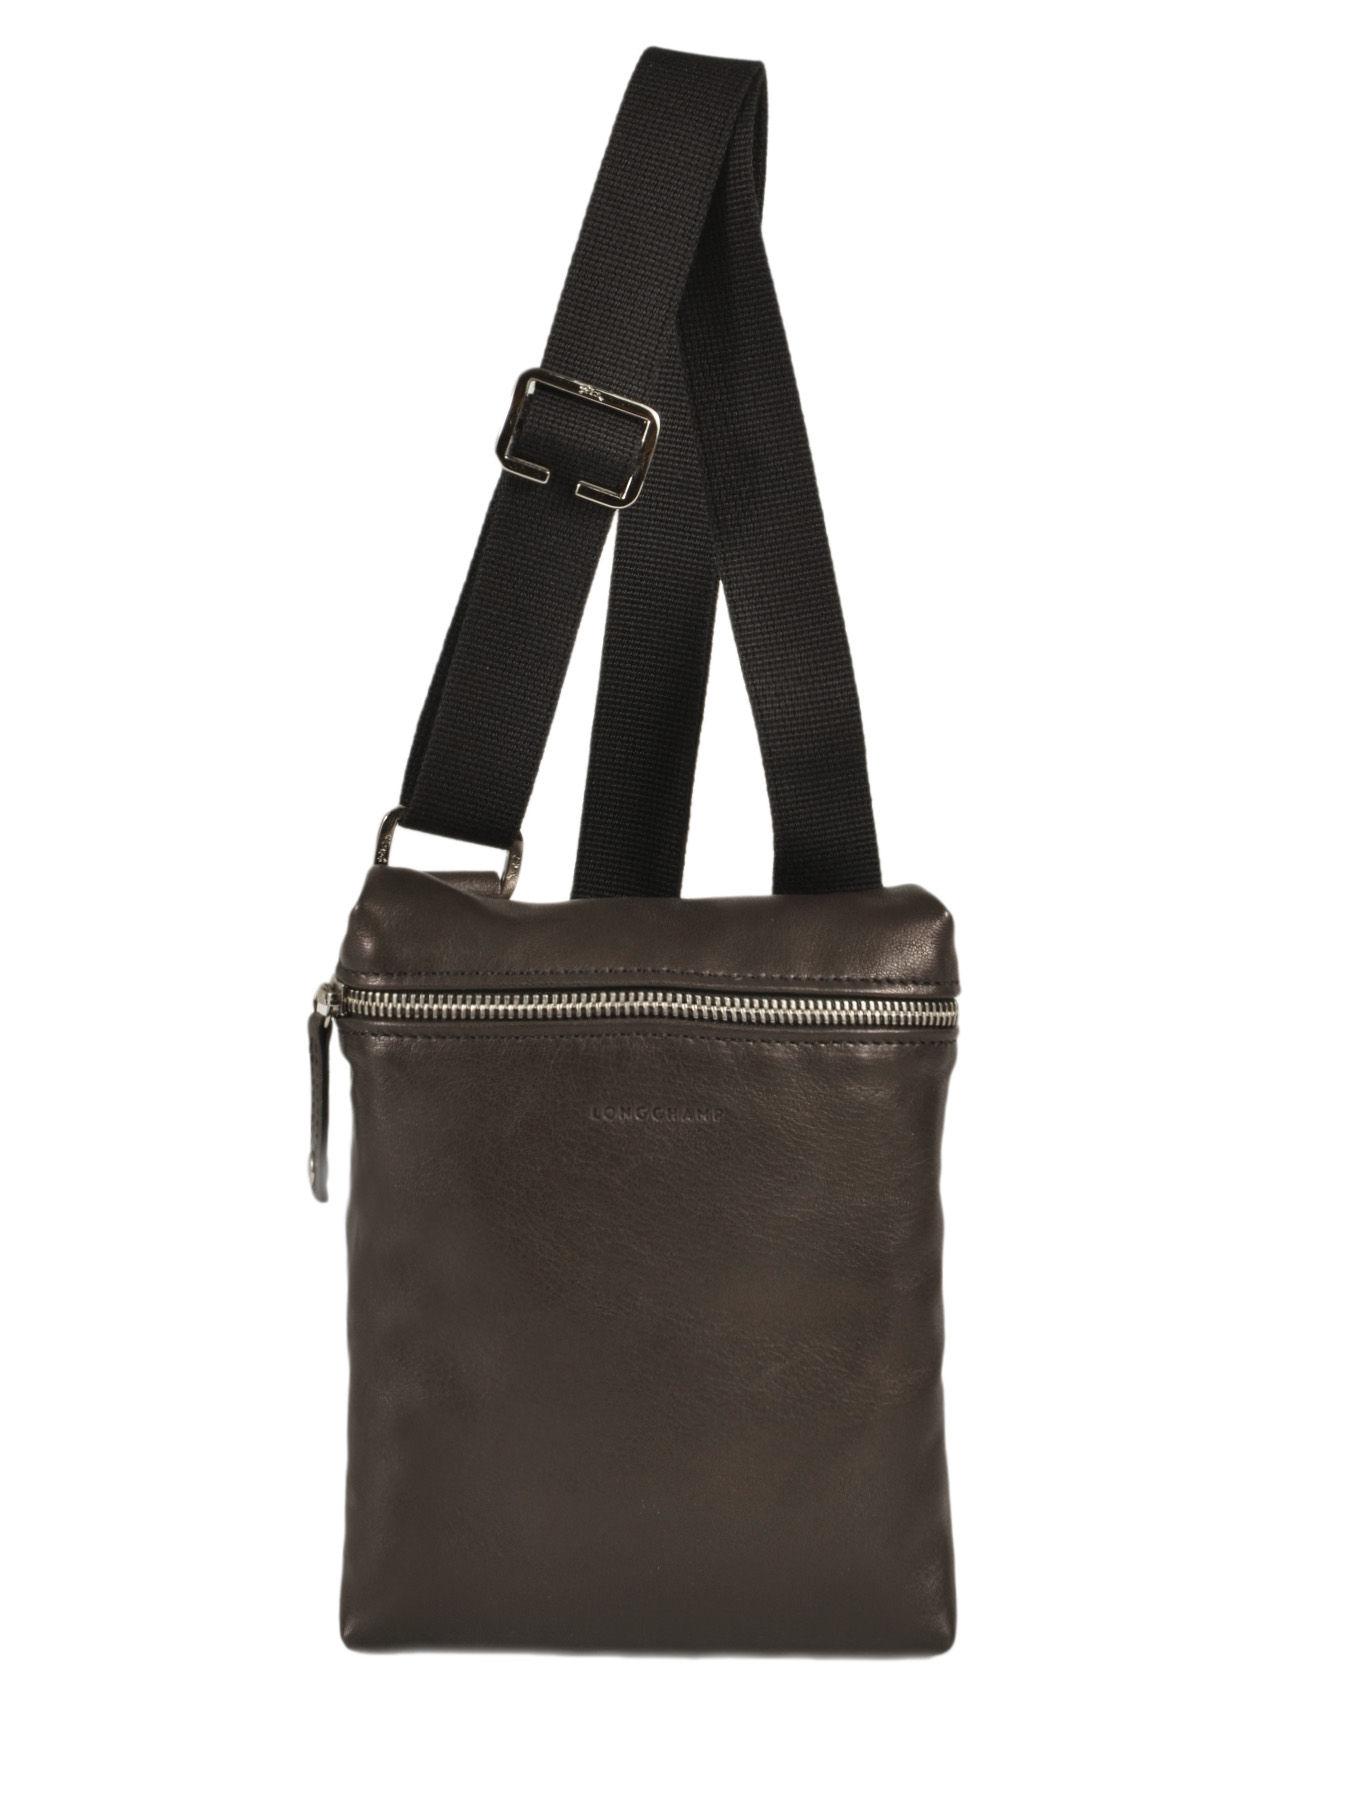 95b003c22a Longchamp Hobo bag 2053798 - best prices